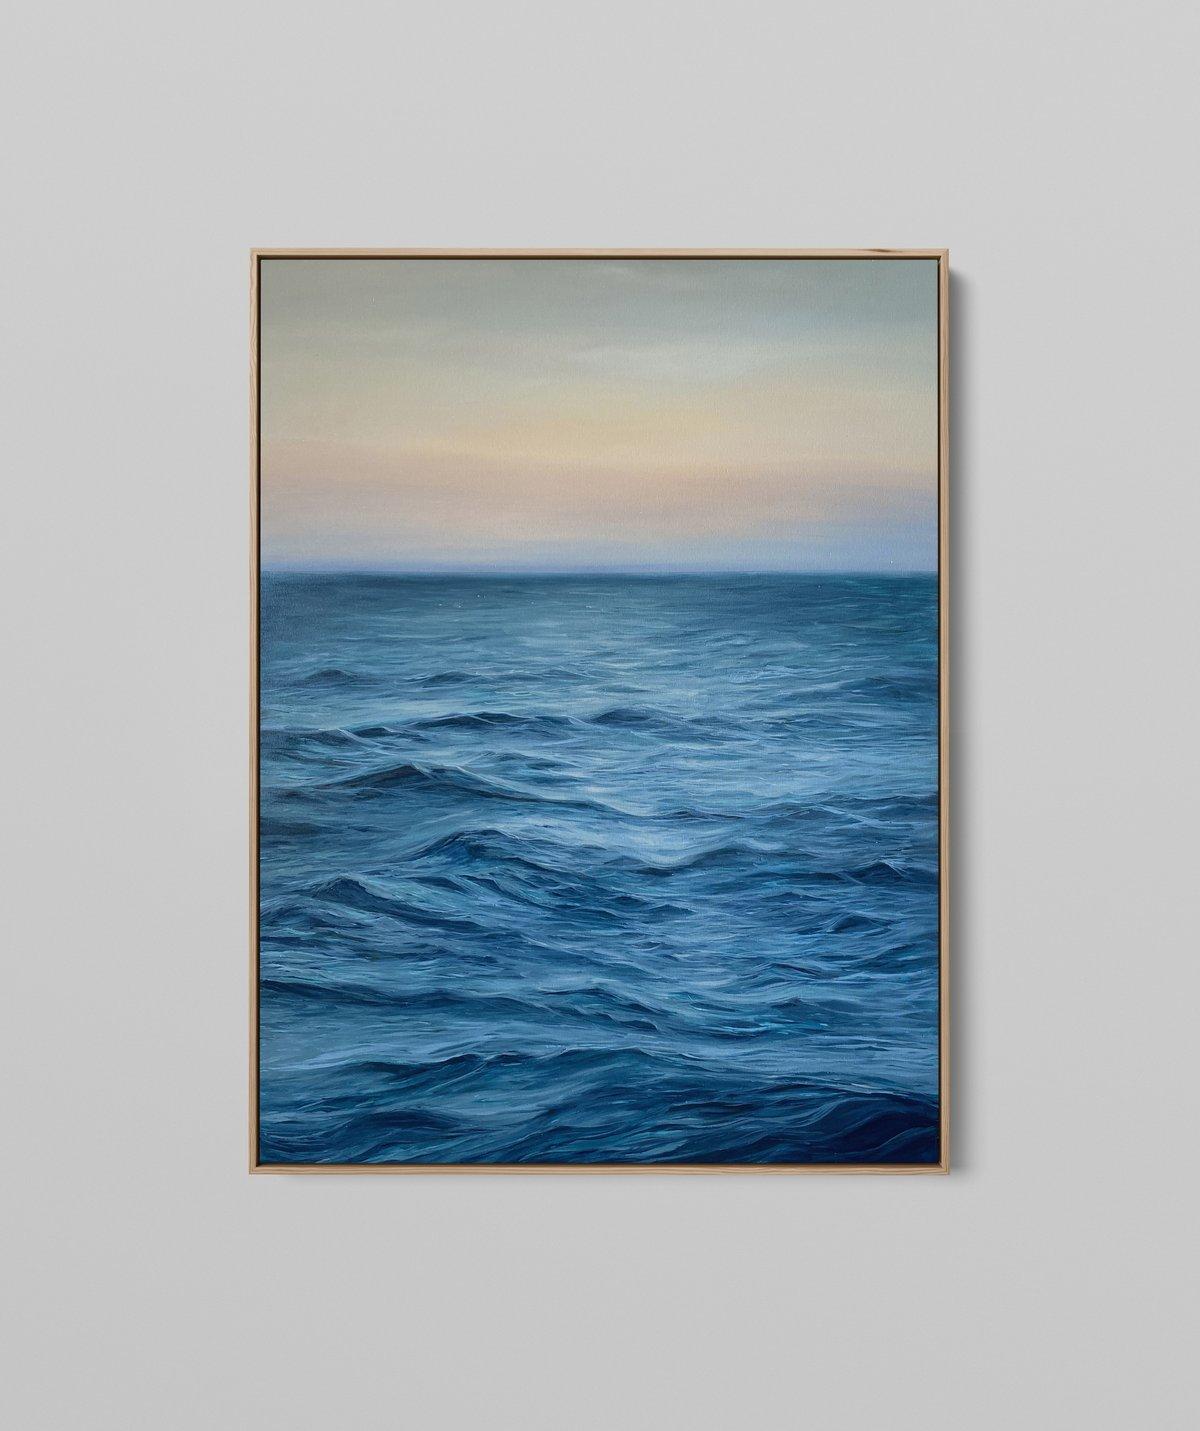 Image of Water No. 36